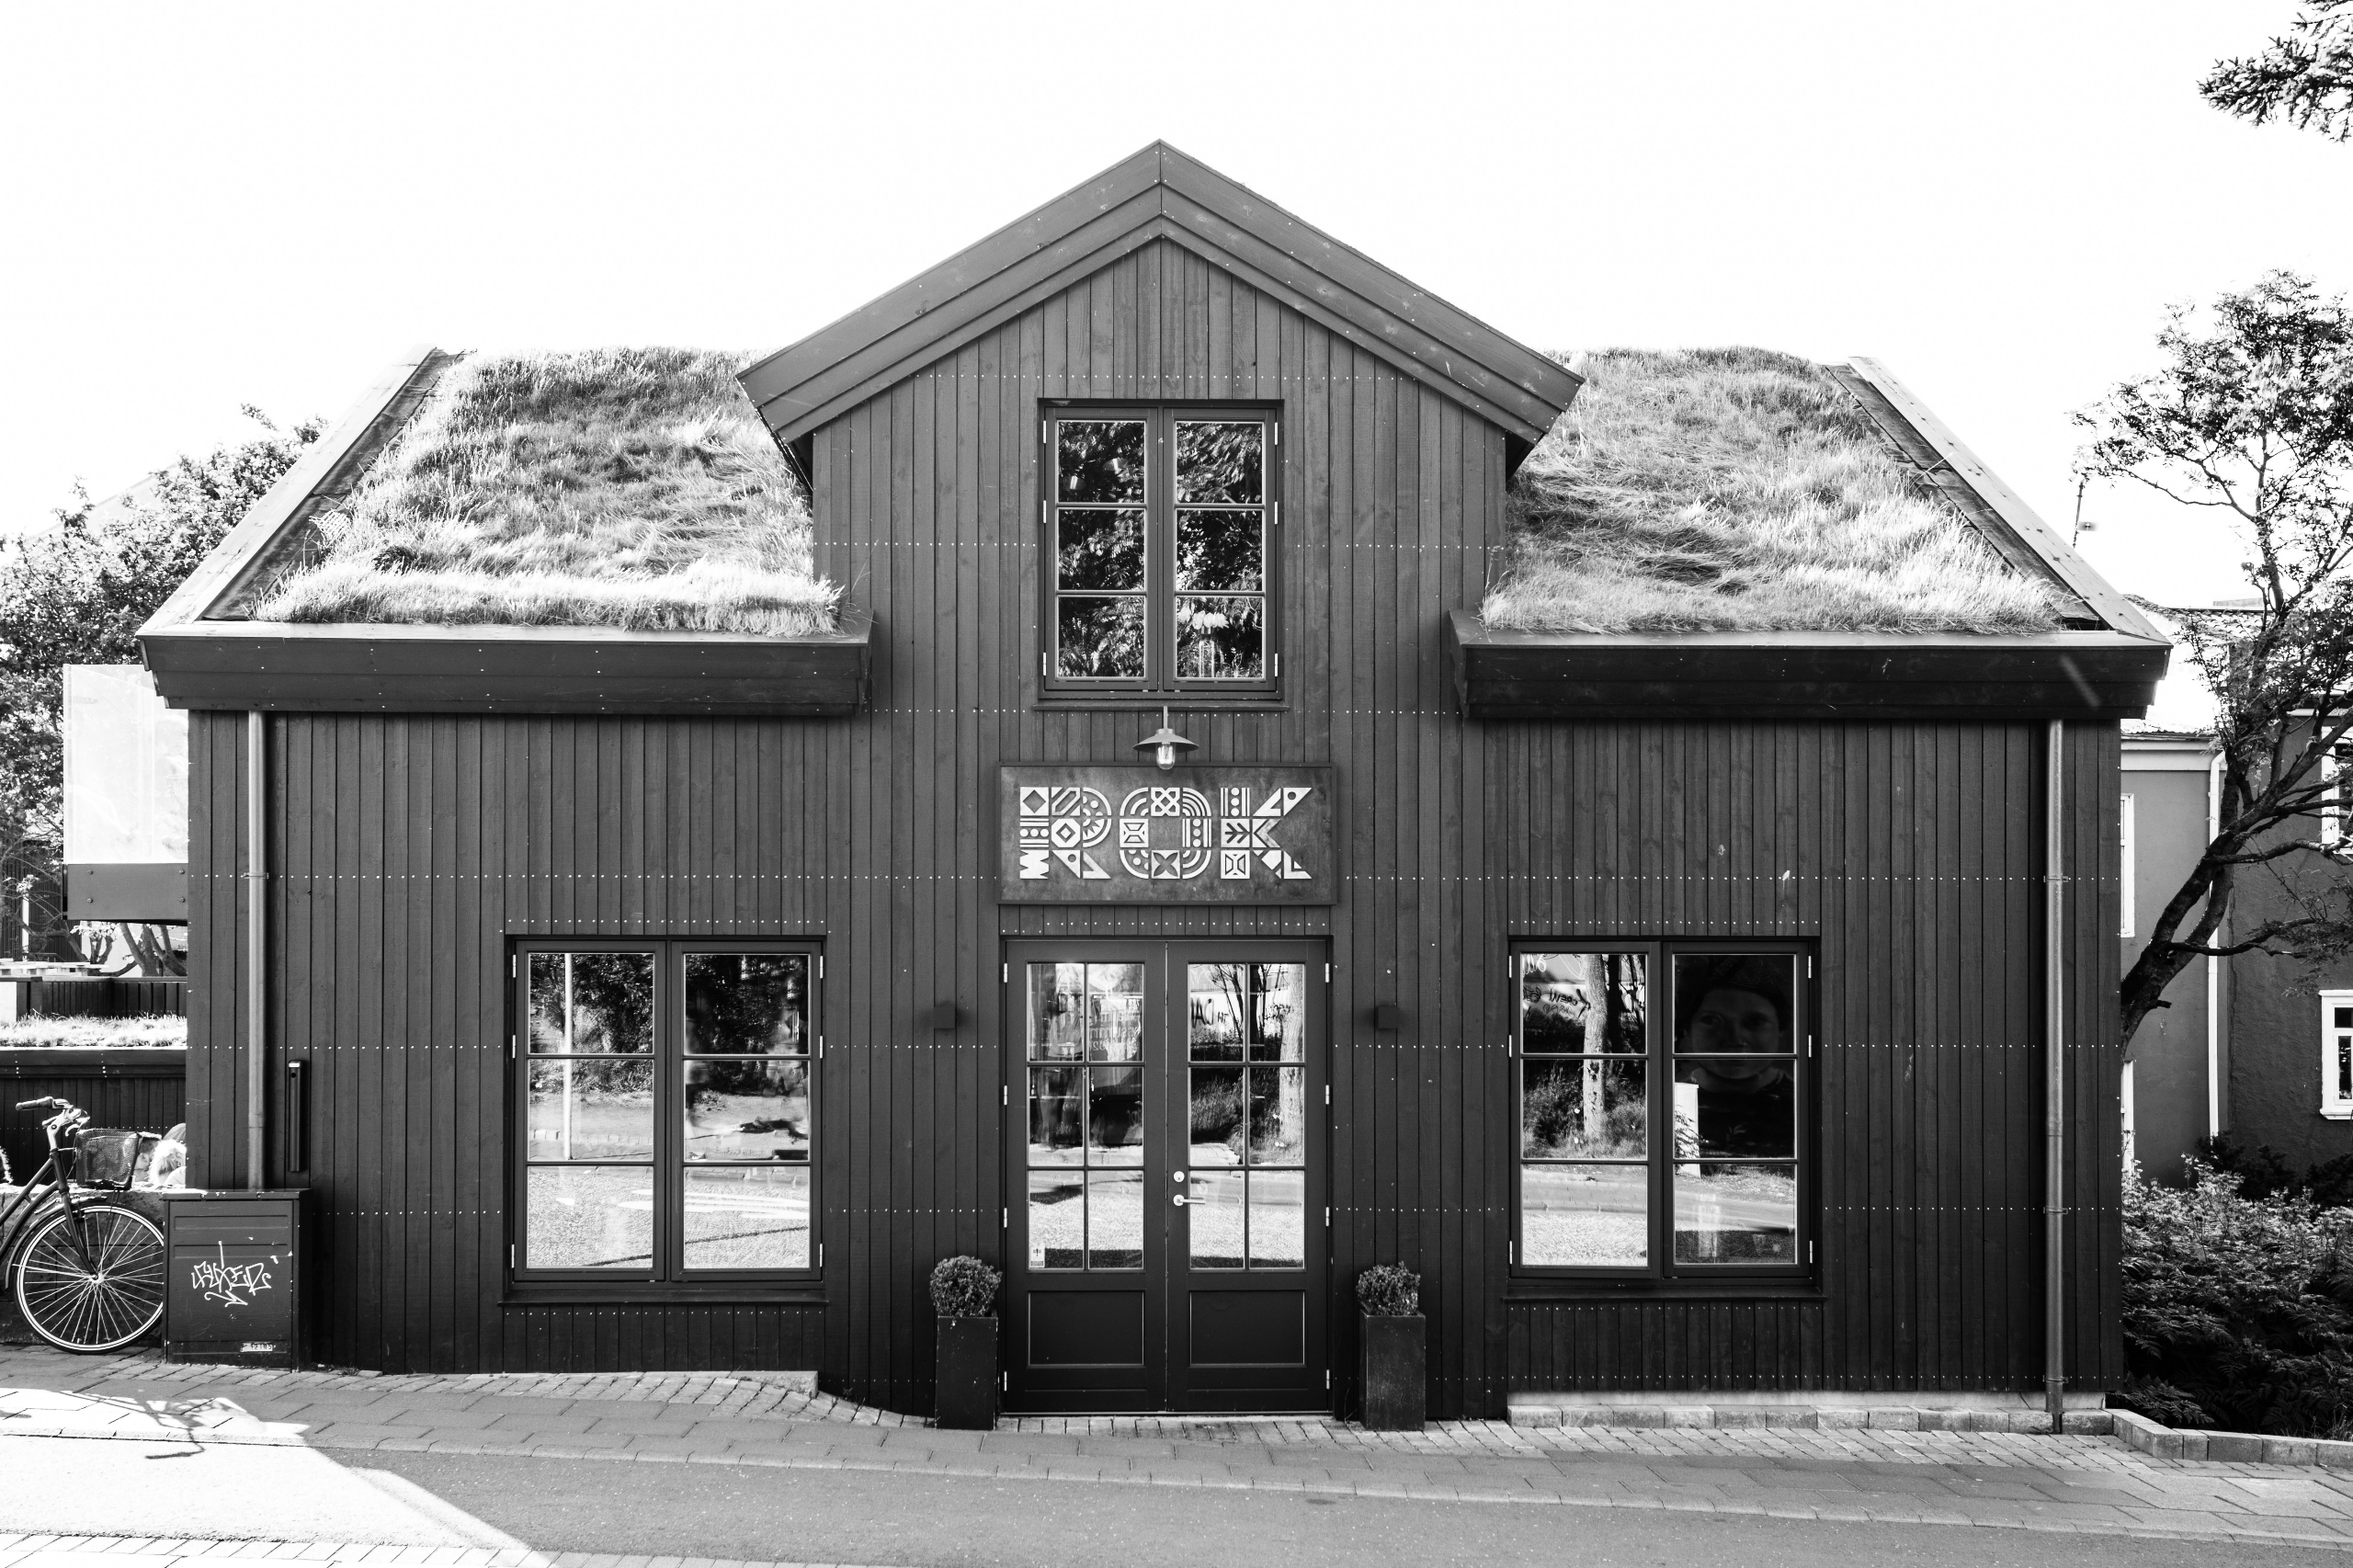 ROK Cafe Reykjavik https://ello - junwin | ello